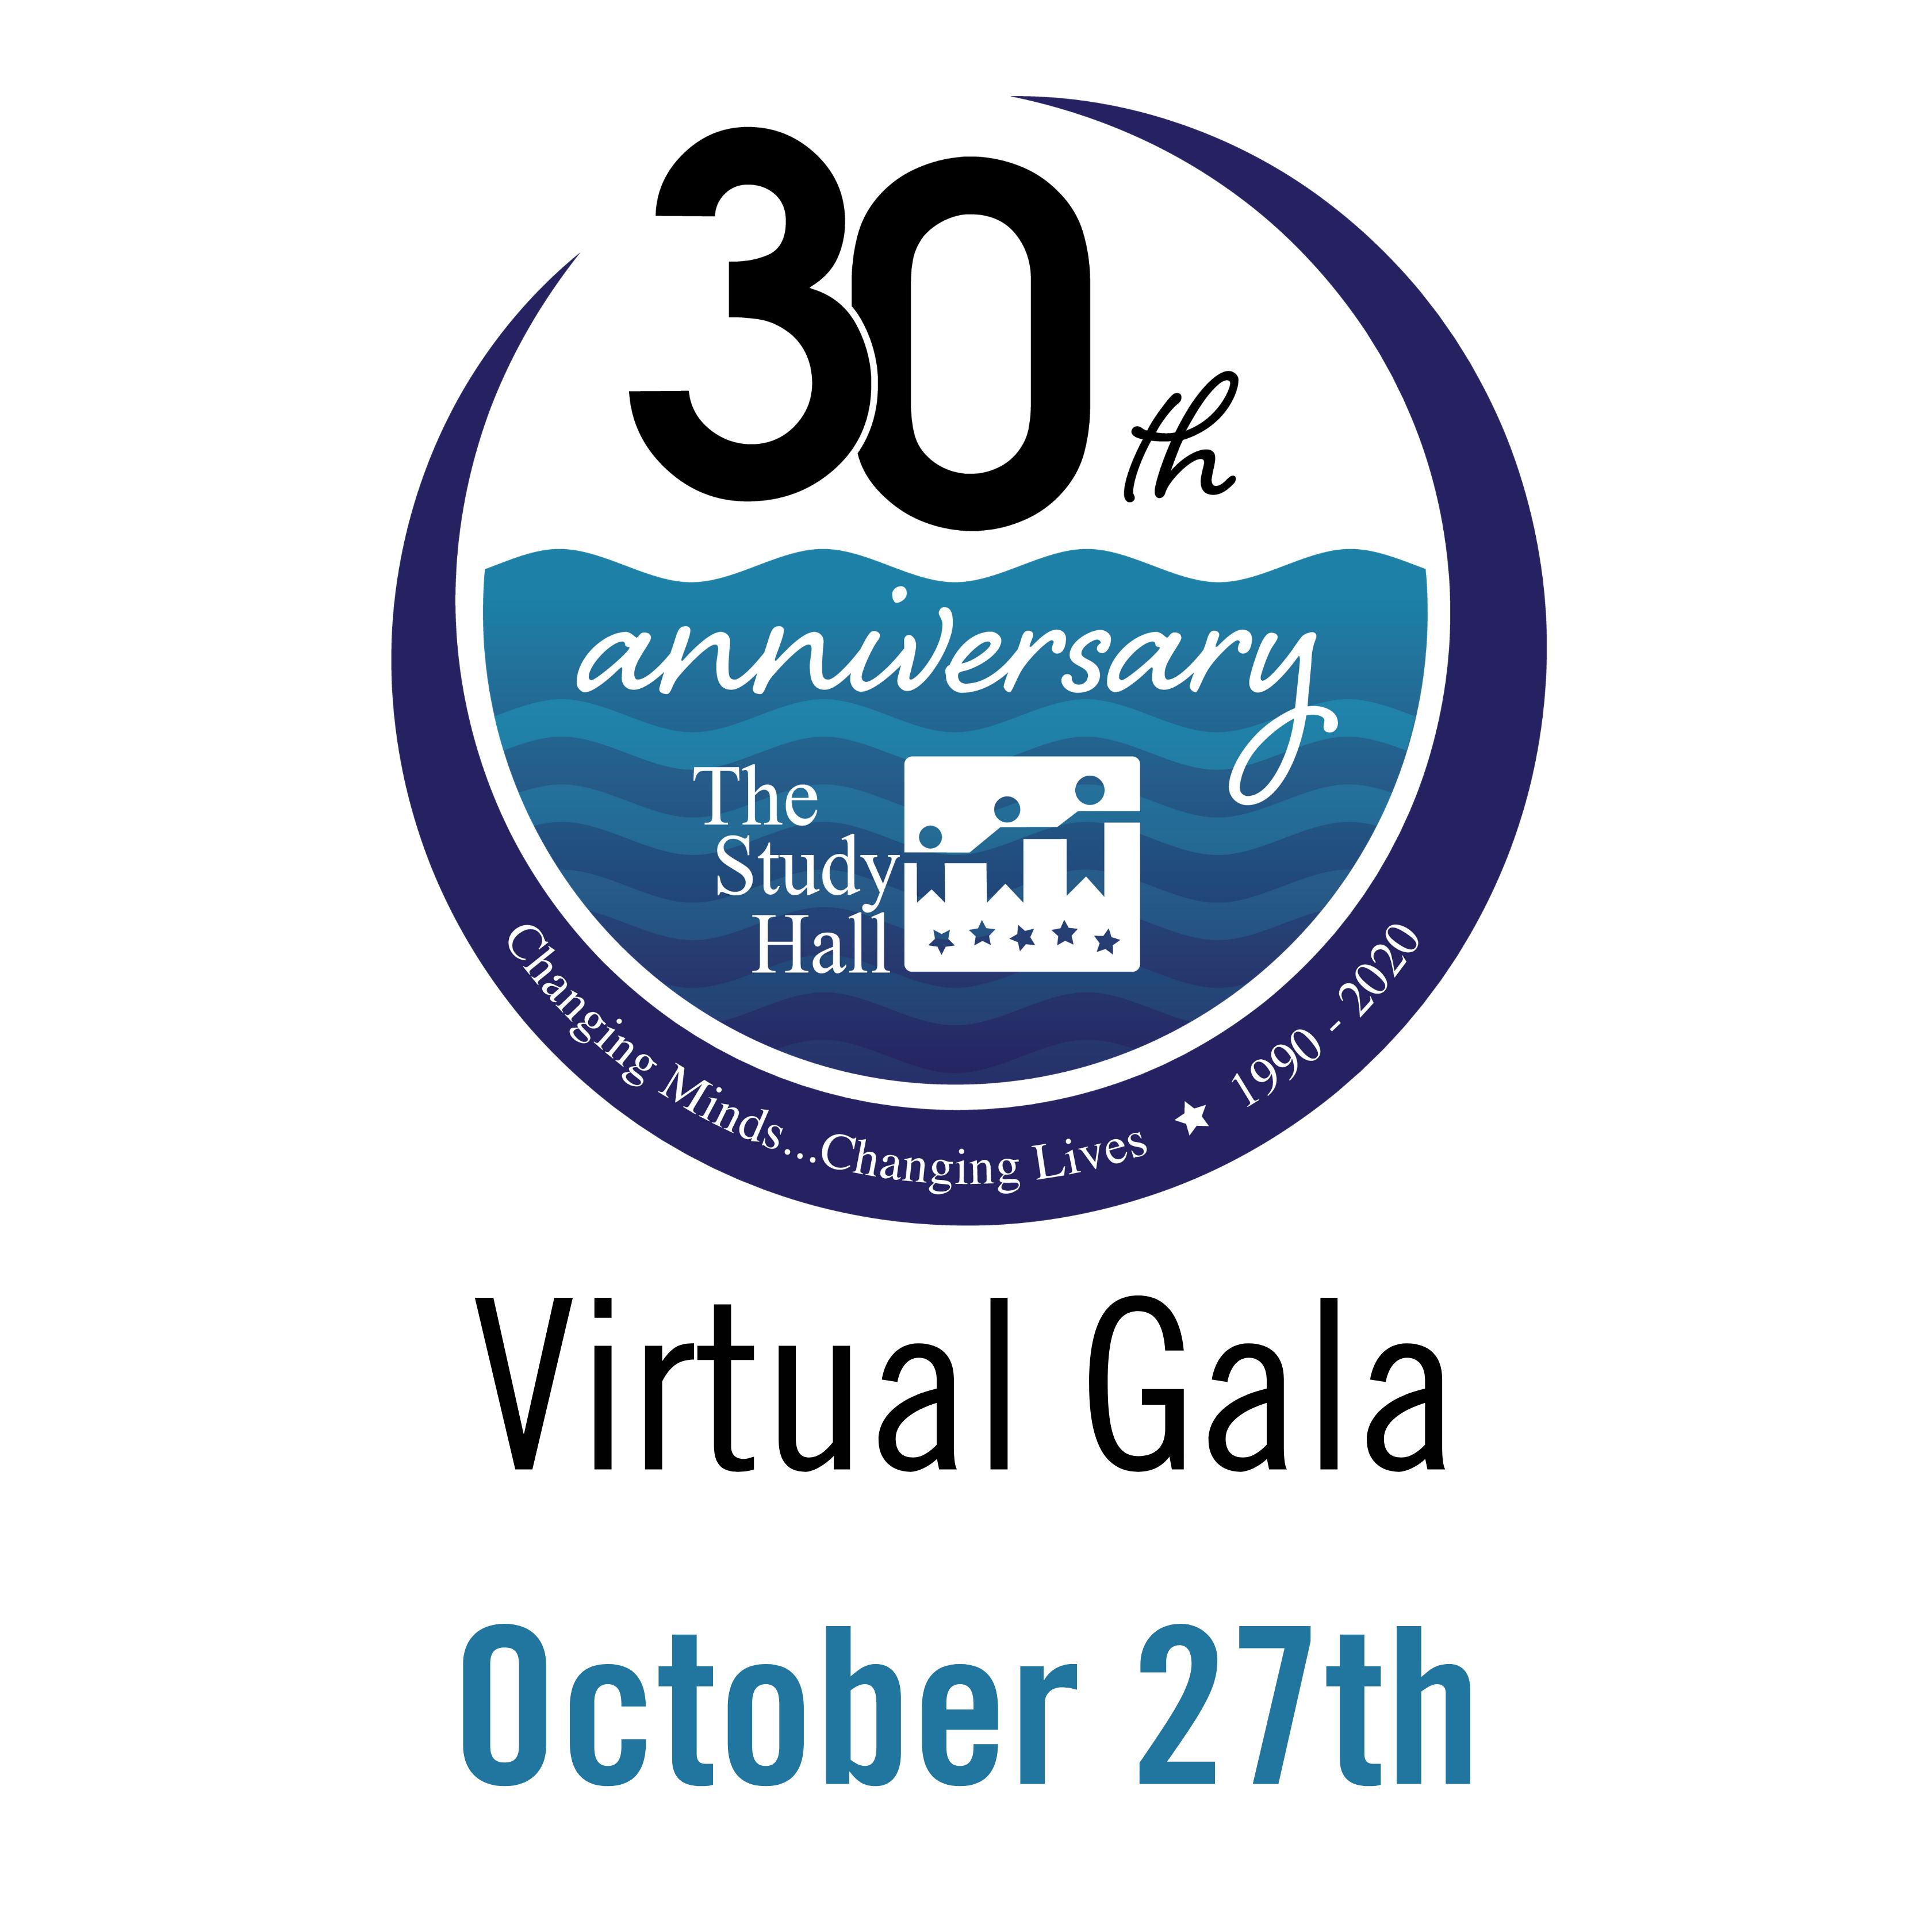 Virtual Gala October 27th